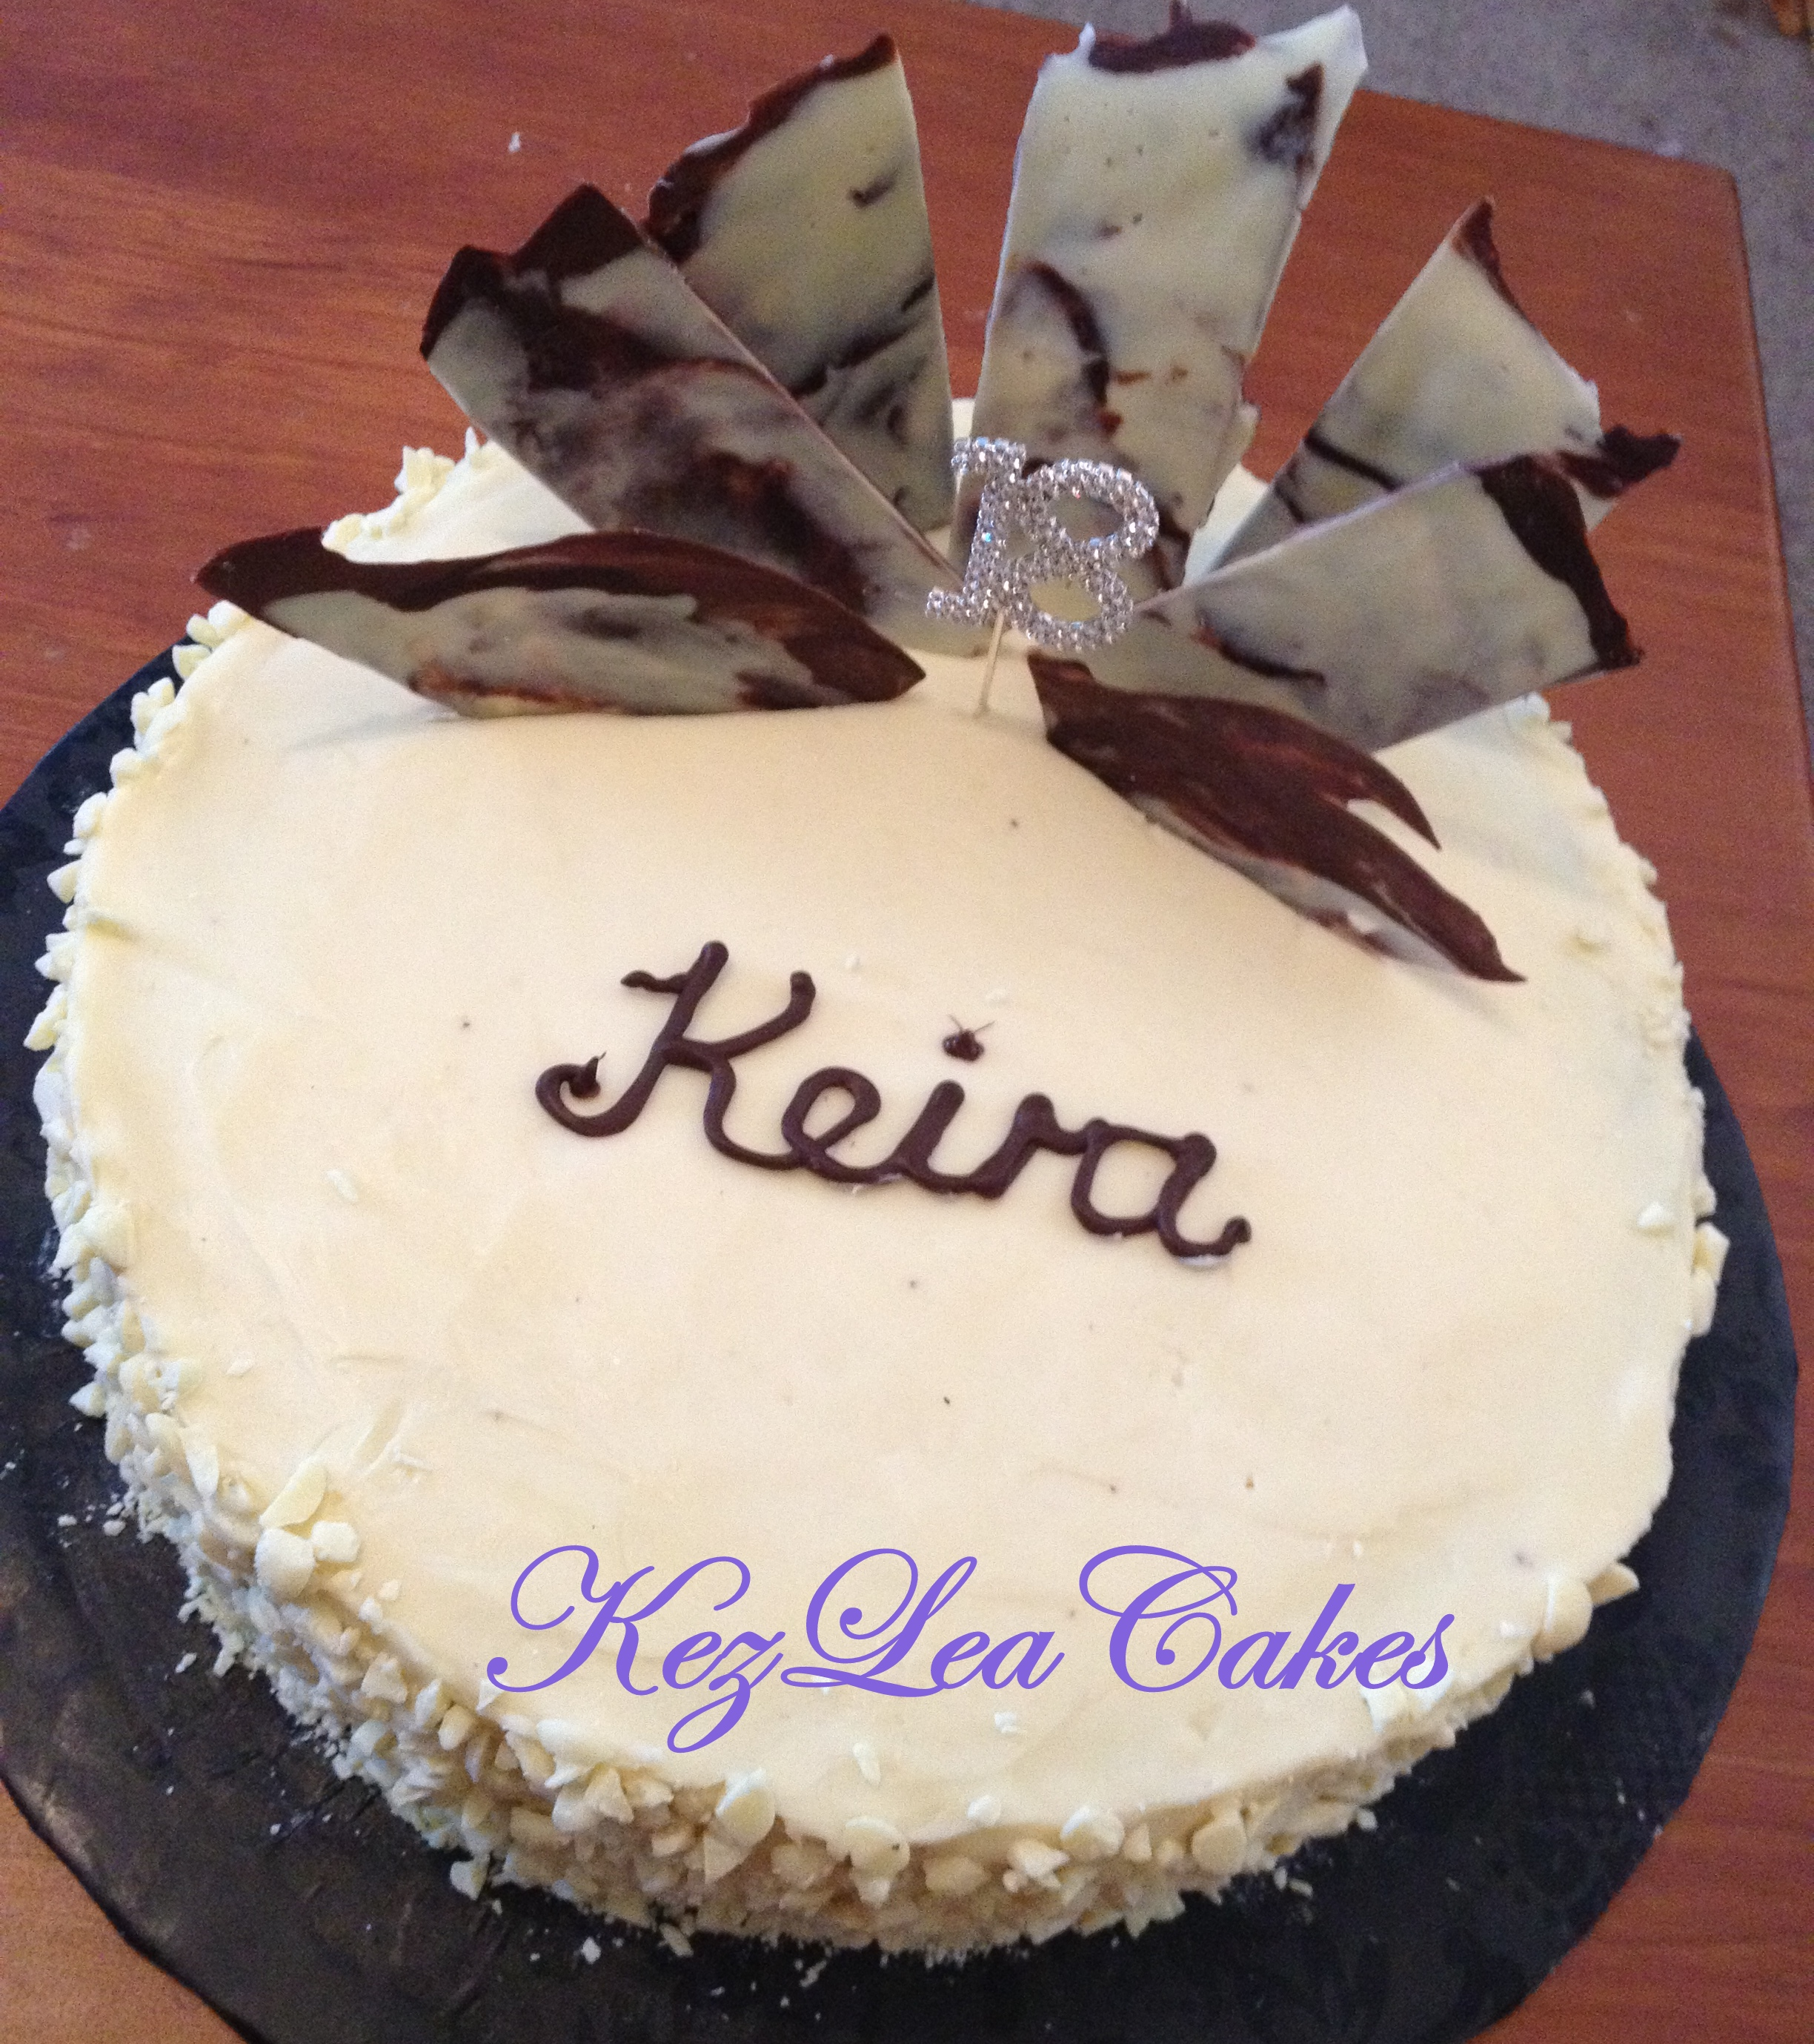 Mud Cake with White Chocolate Ganache and Chocolate Shards Kez Lea